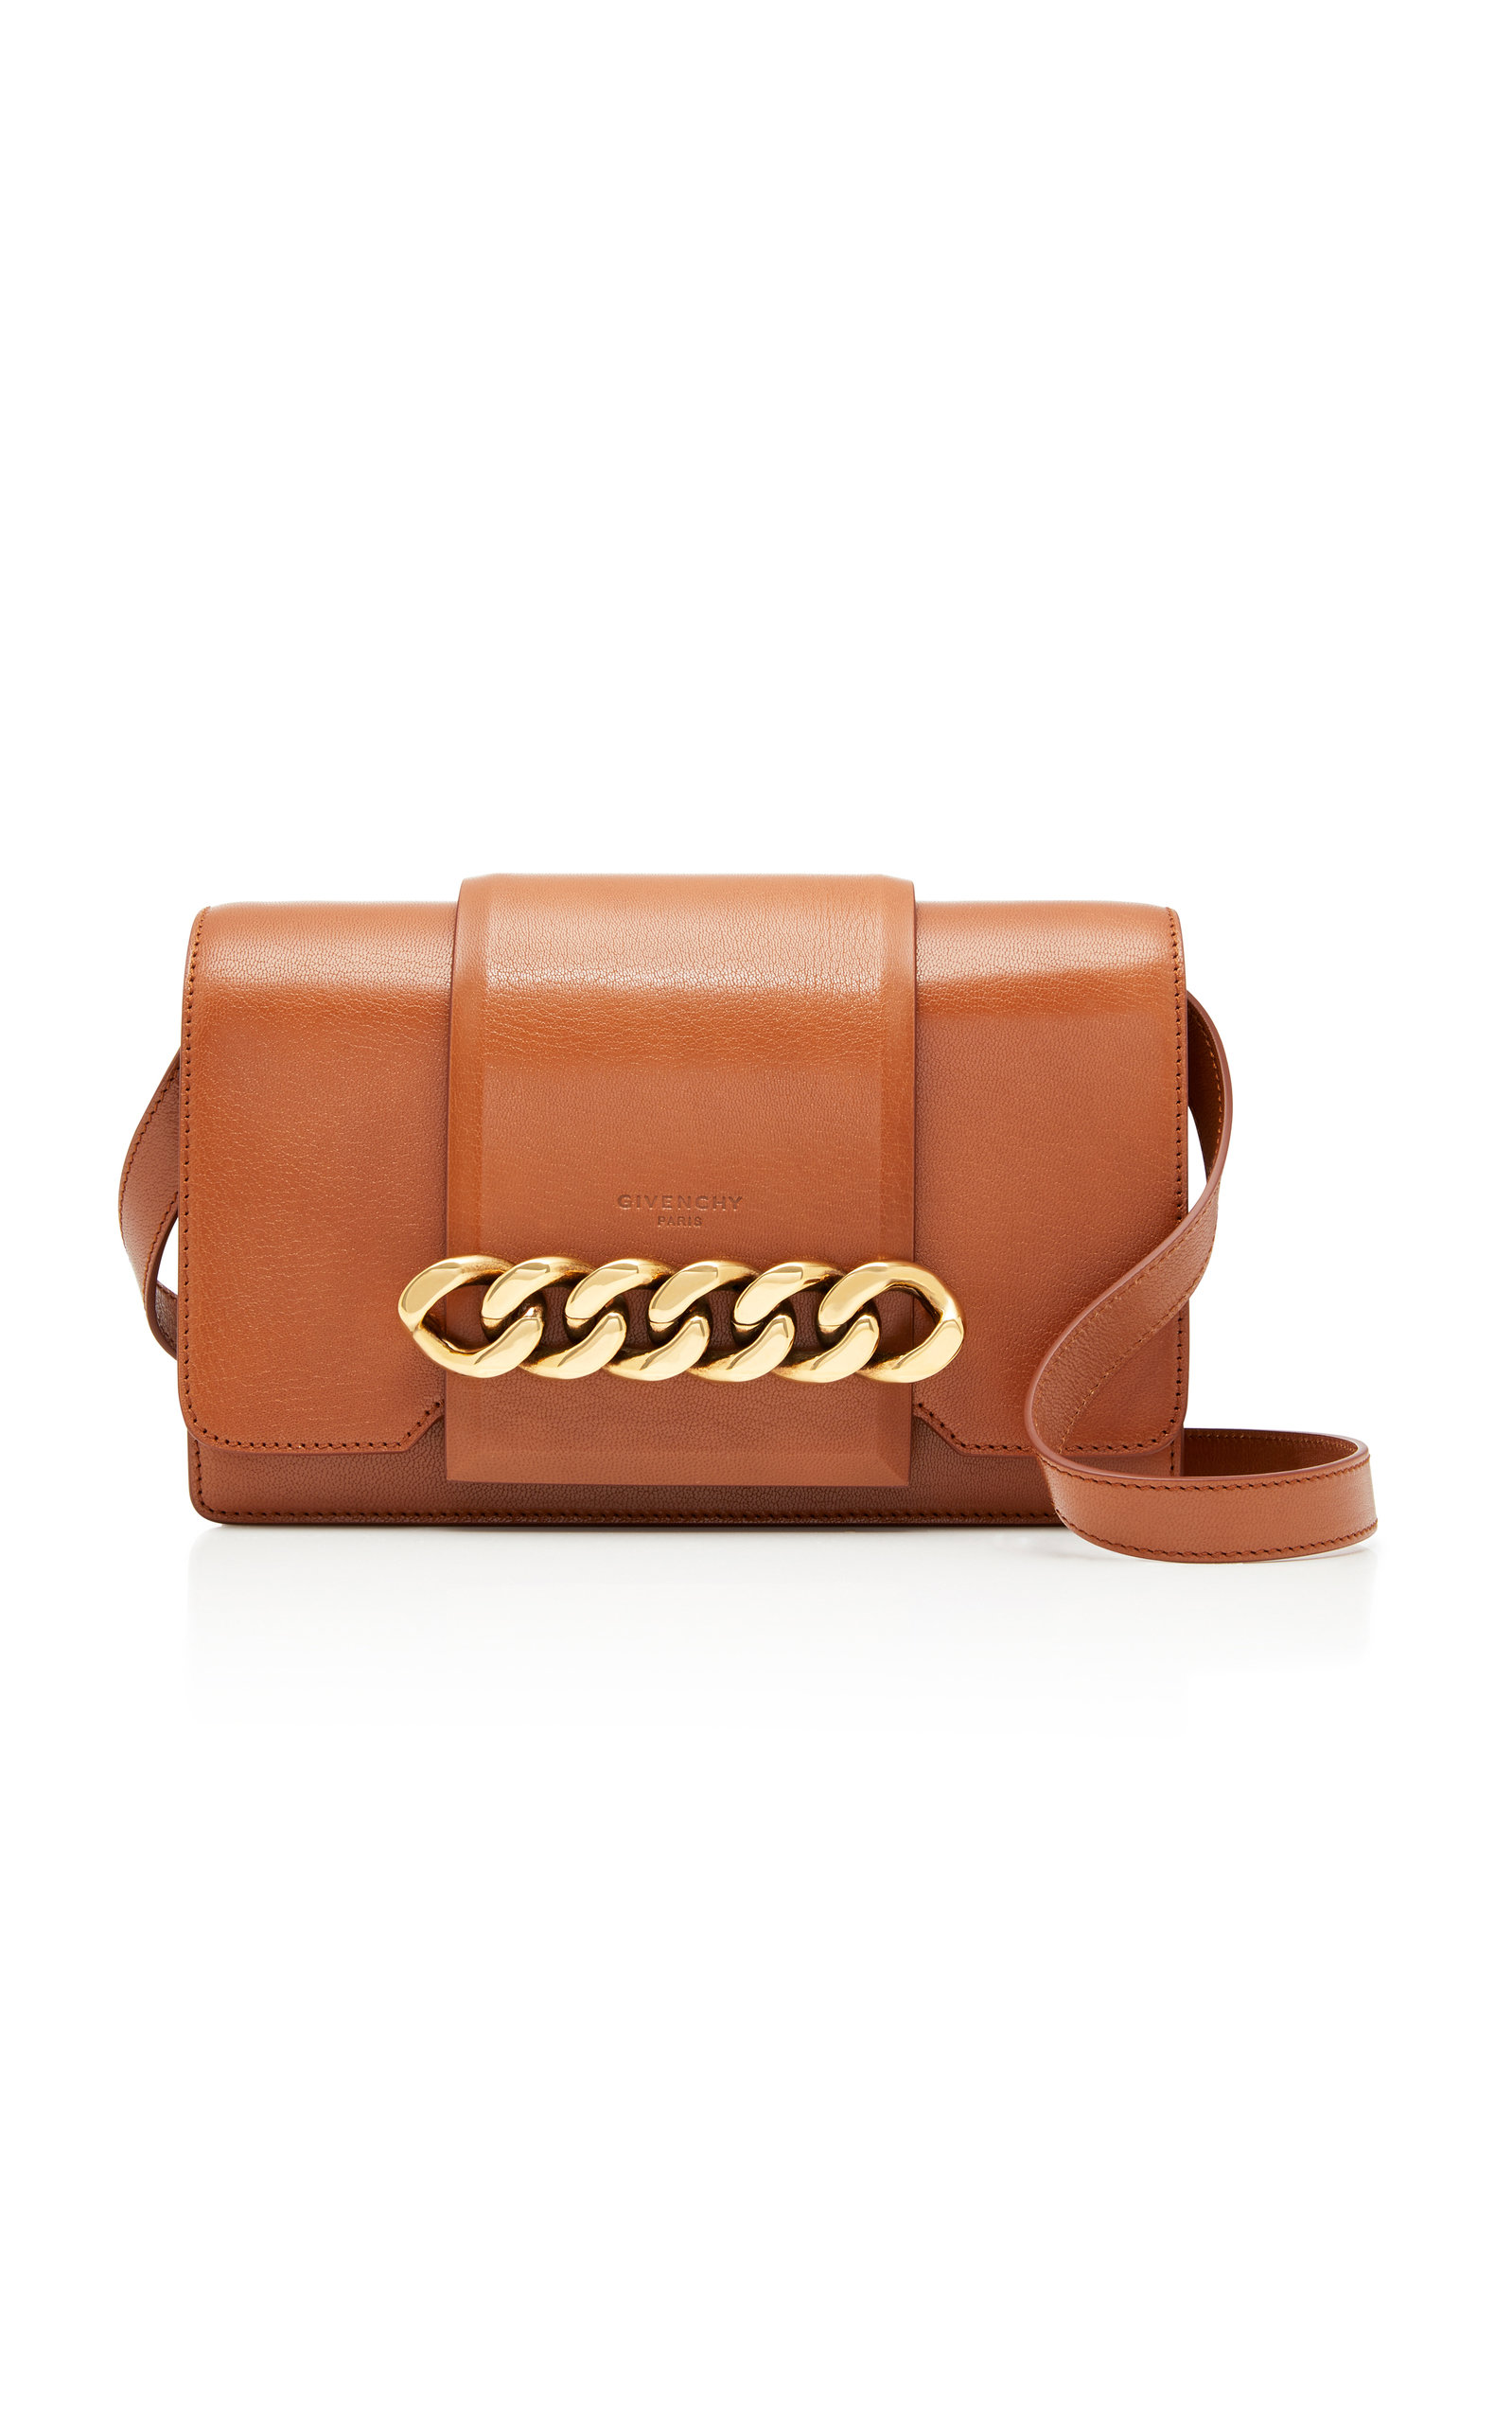 9e2ea8decb28 GivenchyInfinity Chain-Trimmed Leather Shoulder Bag. CLOSE. Loading